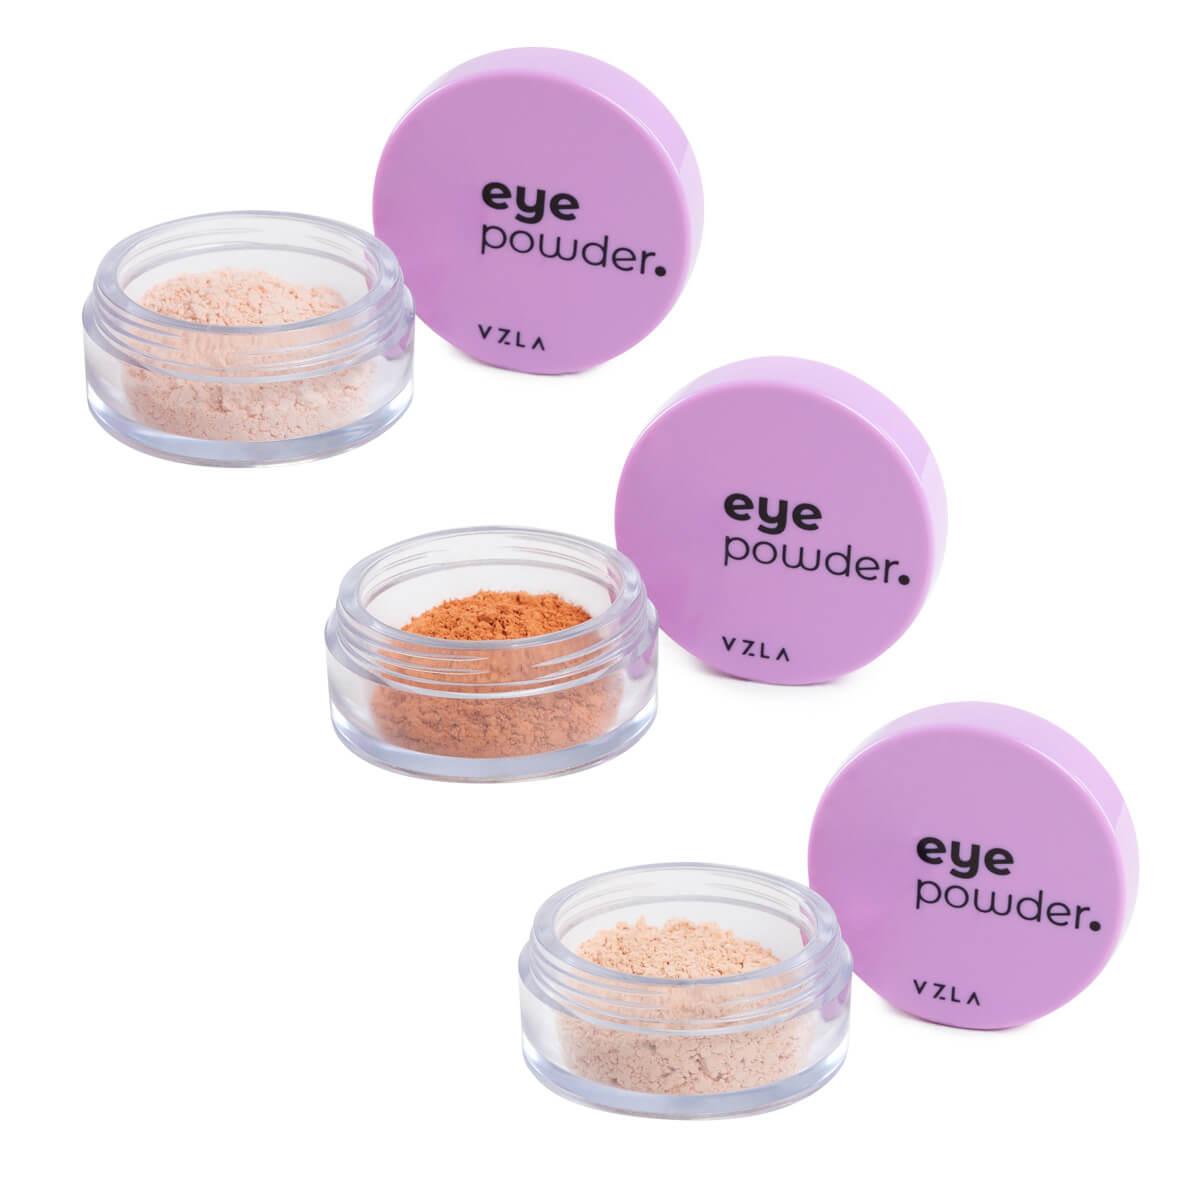 Pó Solto Vizzela Eye Powder - Po para os Olhos Ultrafino